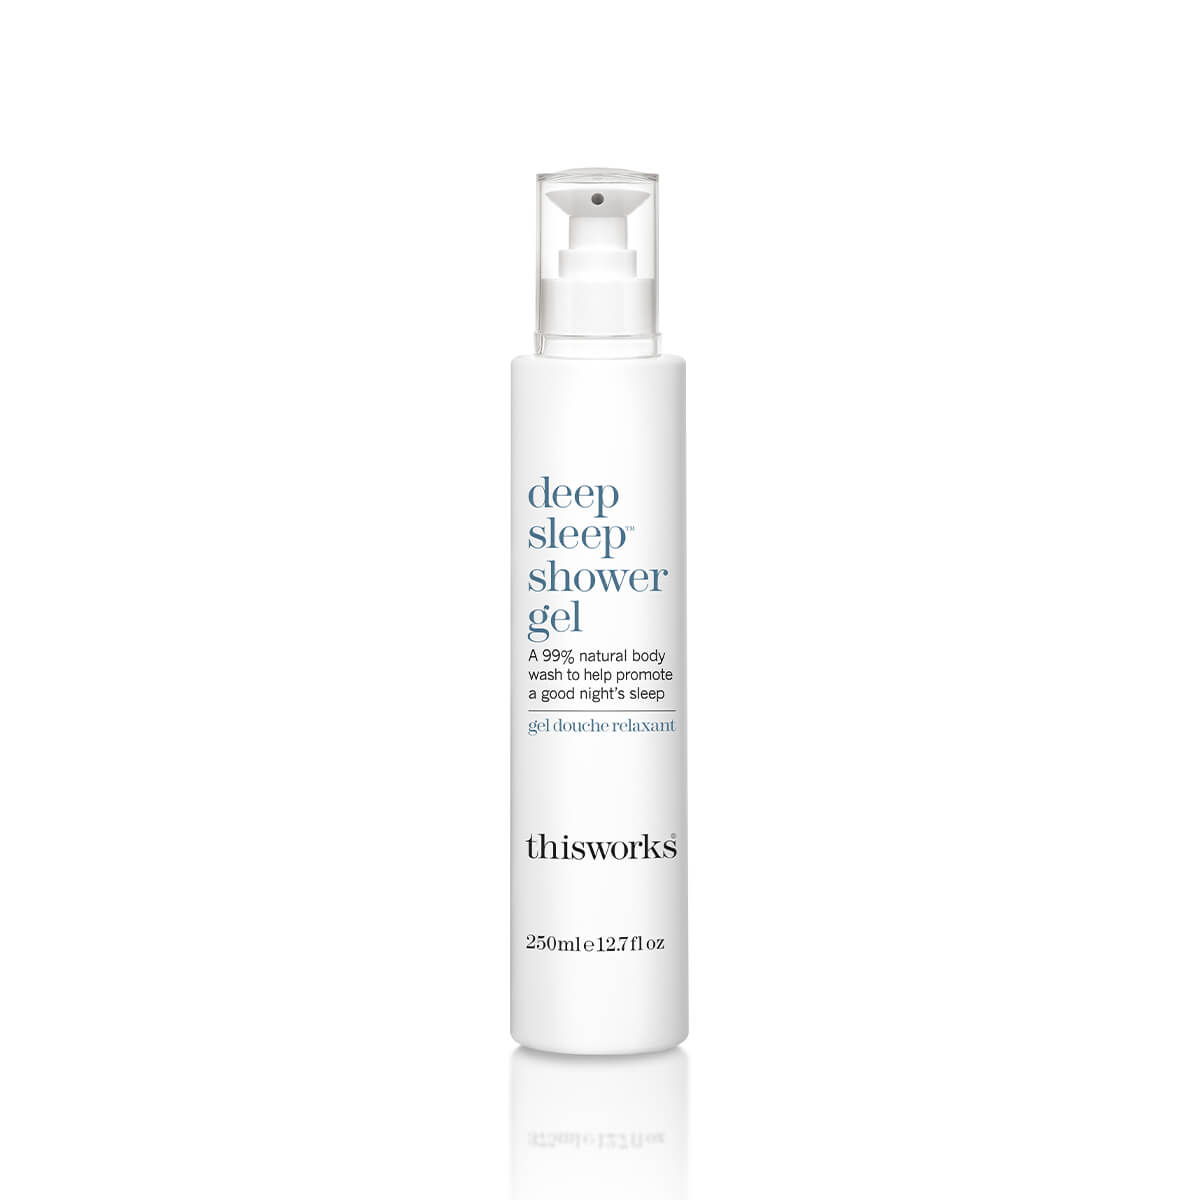 ThisWorks Deep Sleep Shower Gel - front of bottle